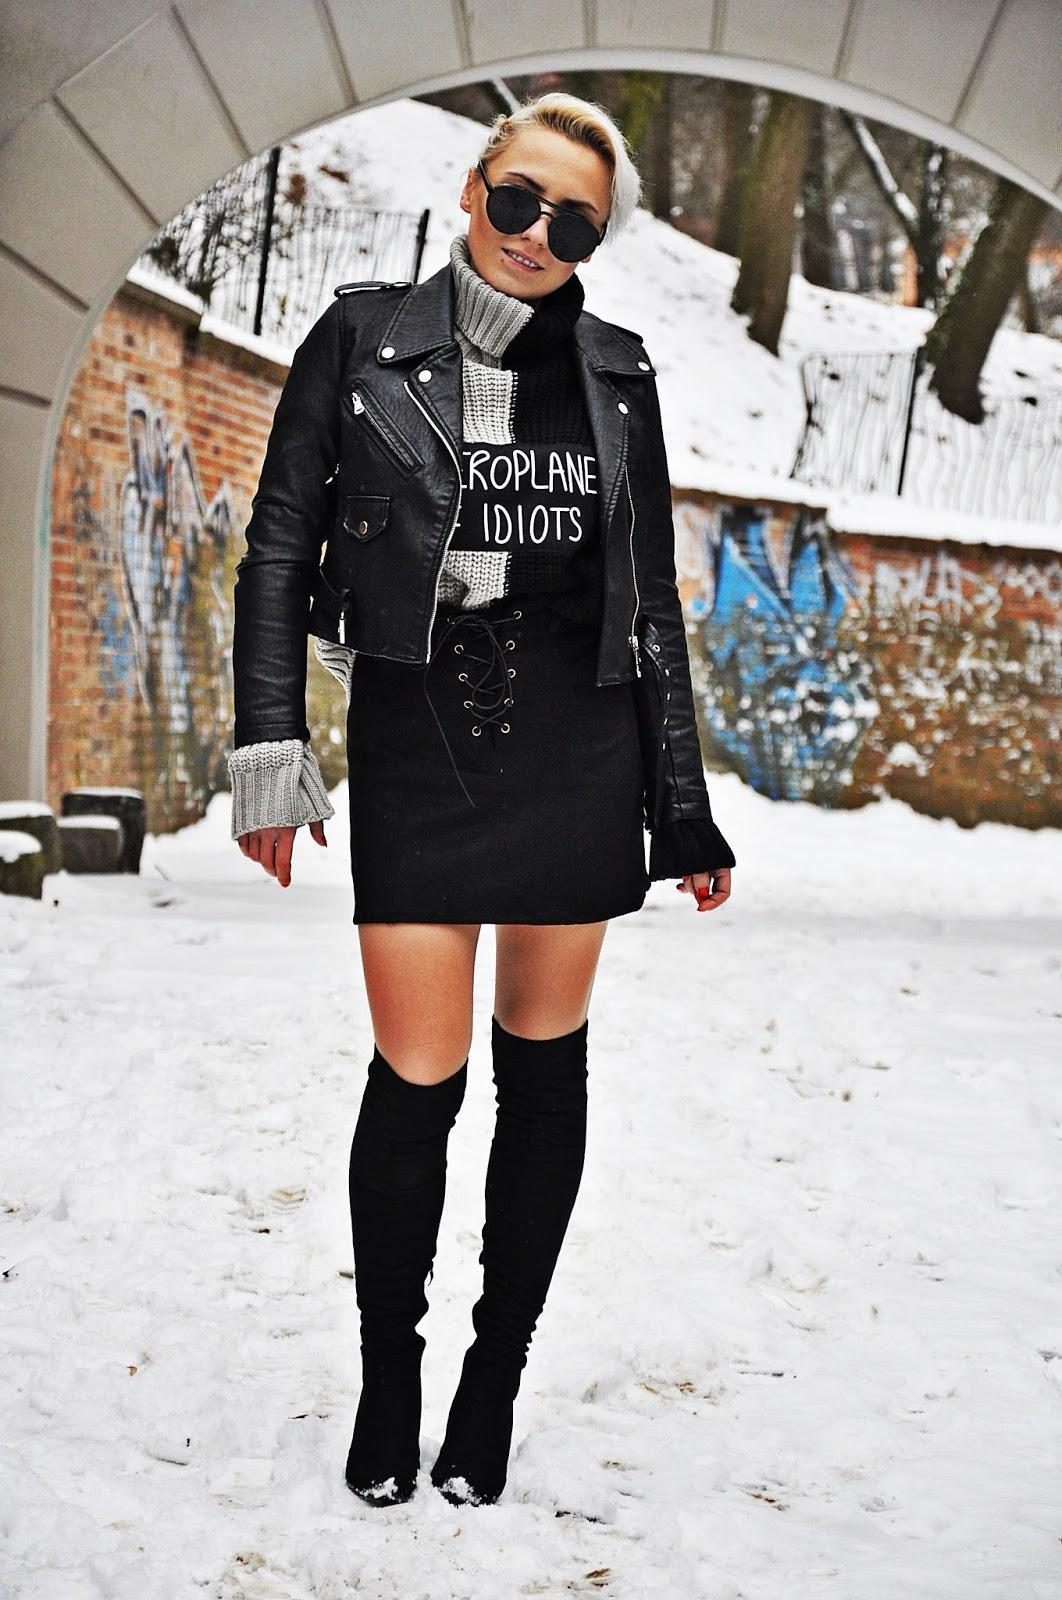 high_knee_boots_karyn_biker_jacket_look_190117